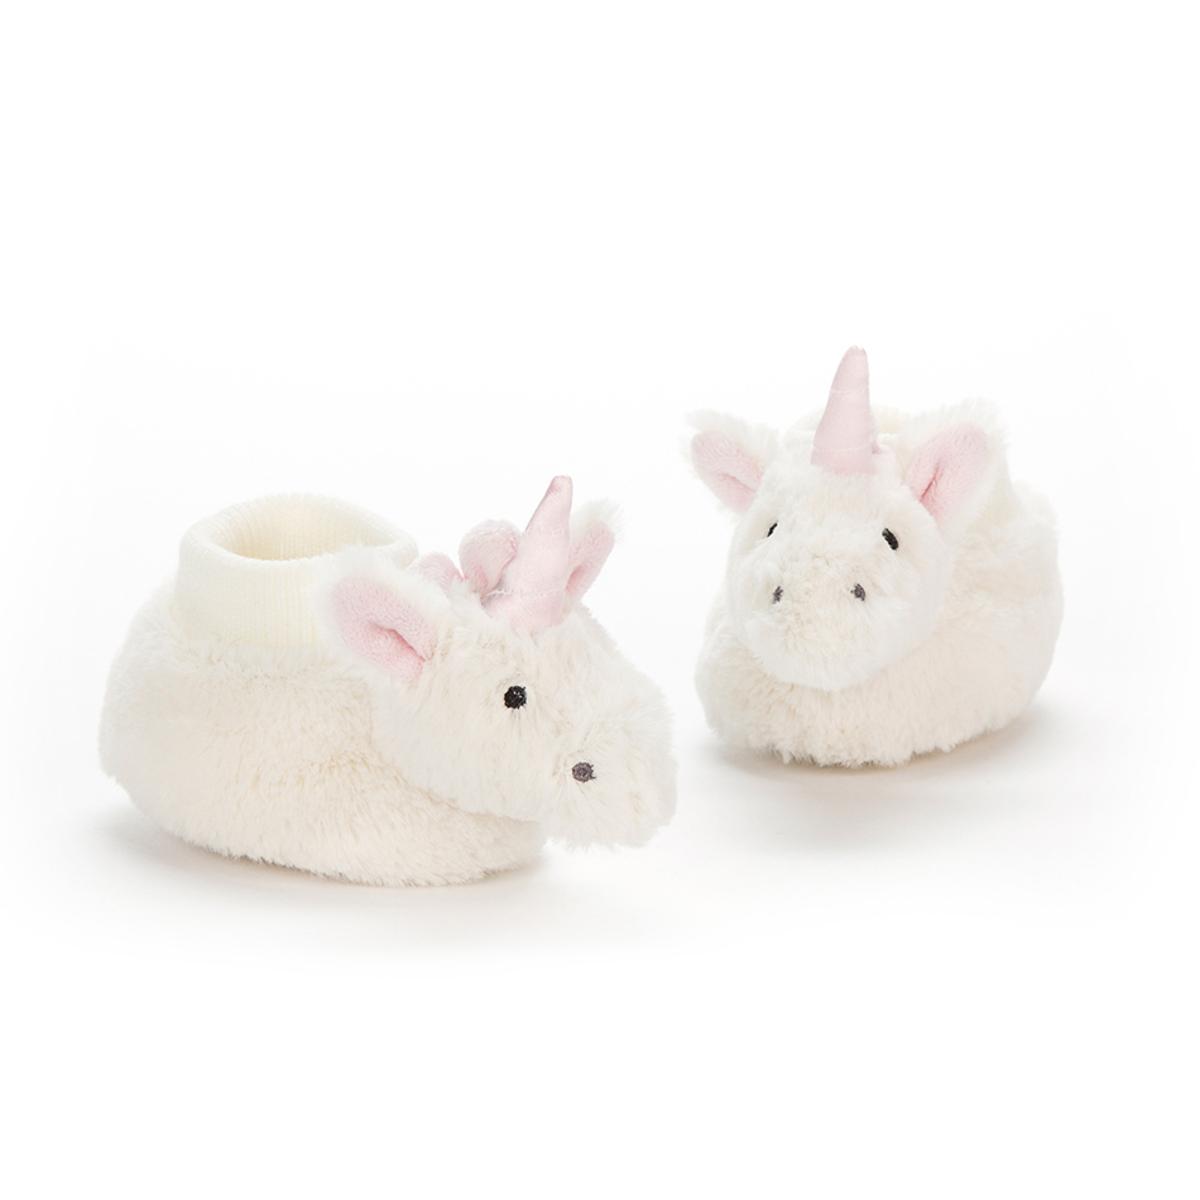 Chaussons & Chaussures Bashful Unicorn Booties